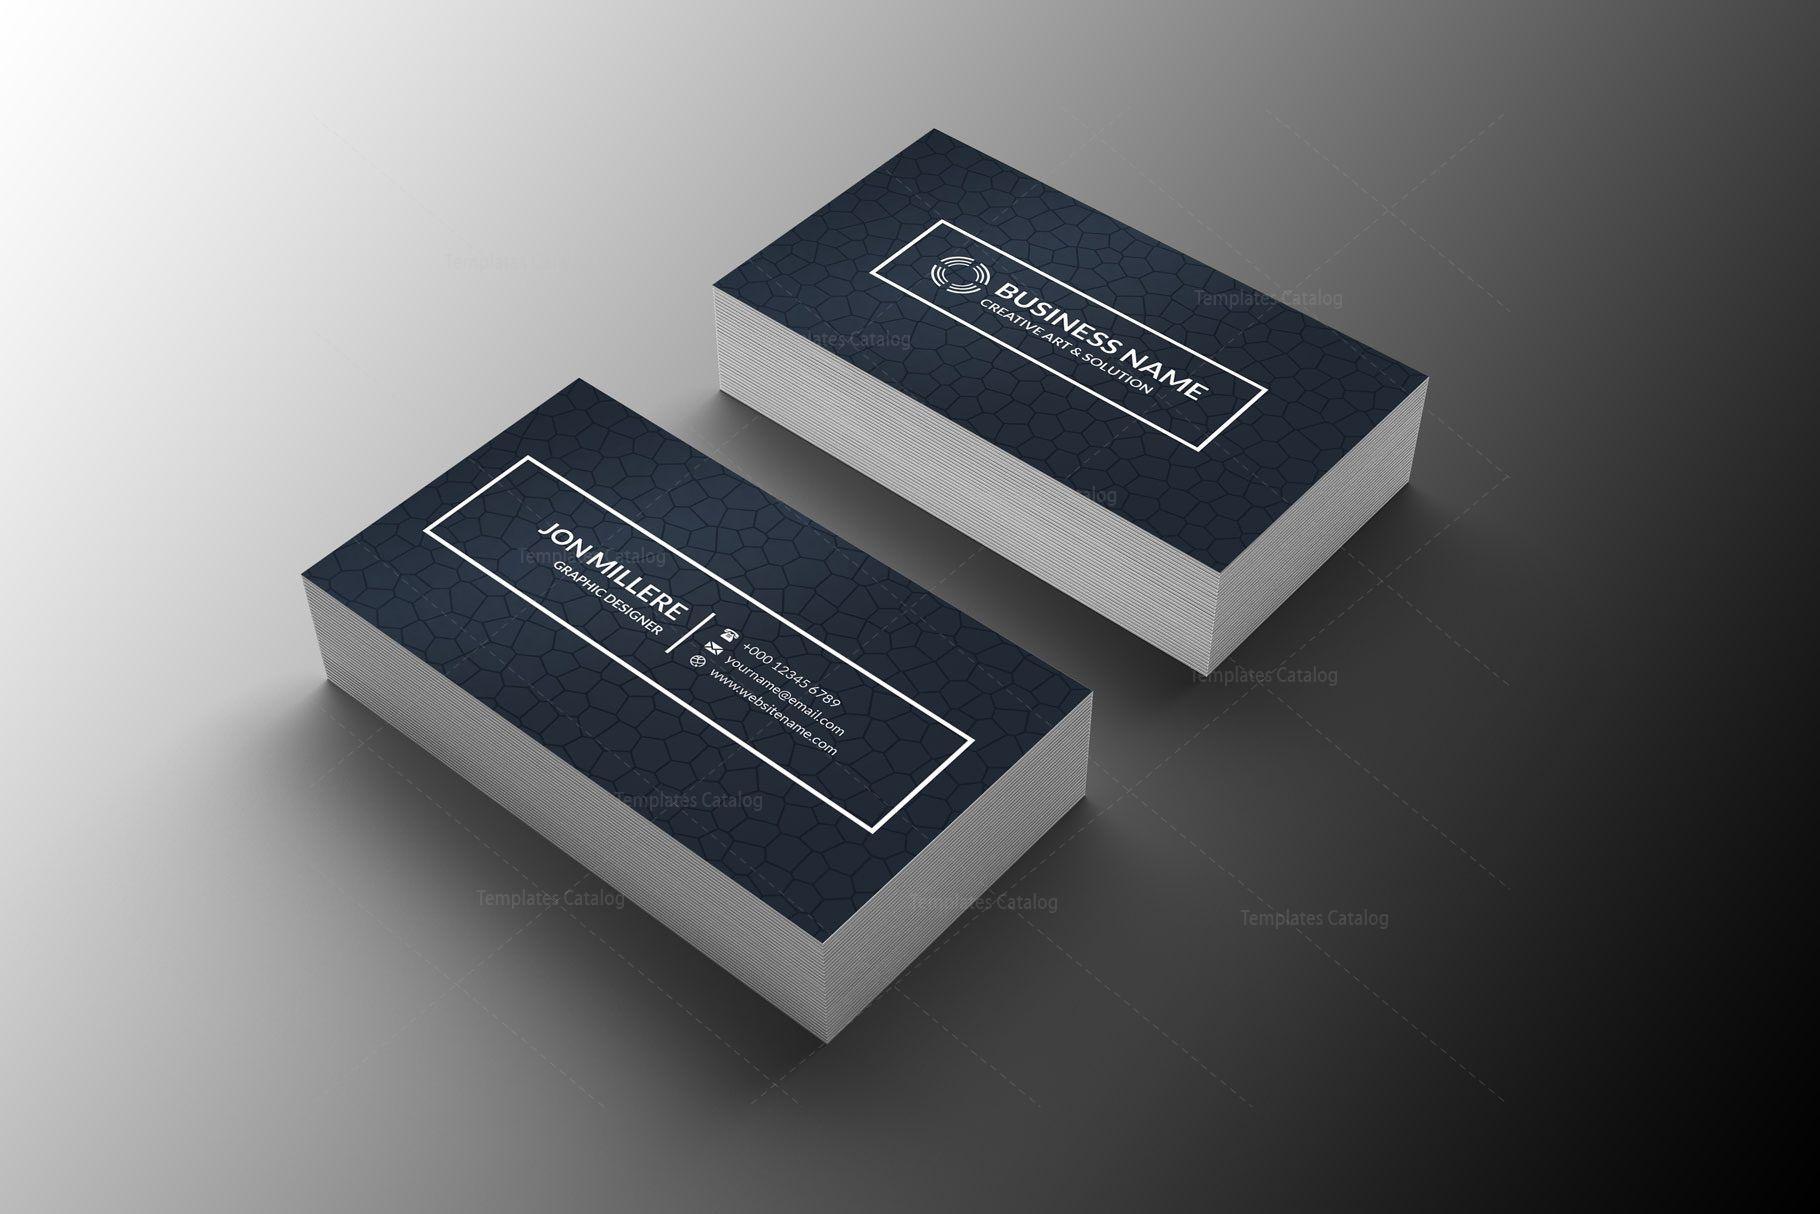 Engineer Minimal Business Card Design Graphic Templates Business Card Design Minimal Minimal Business Card Business Card Design